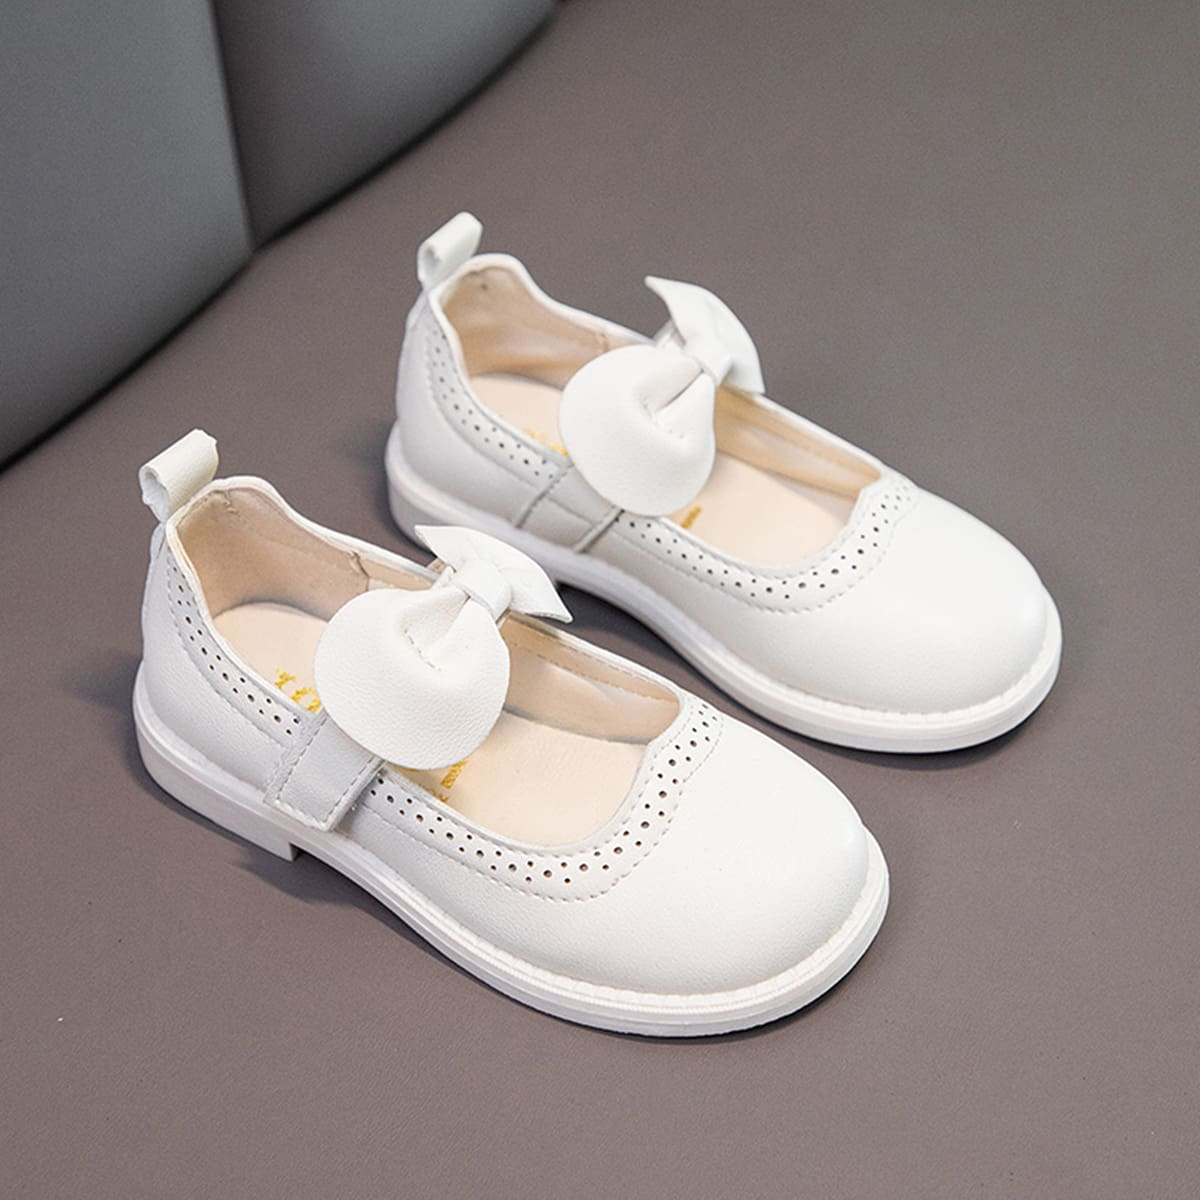 Zapatos planos para niños pequeños Lazo Liso